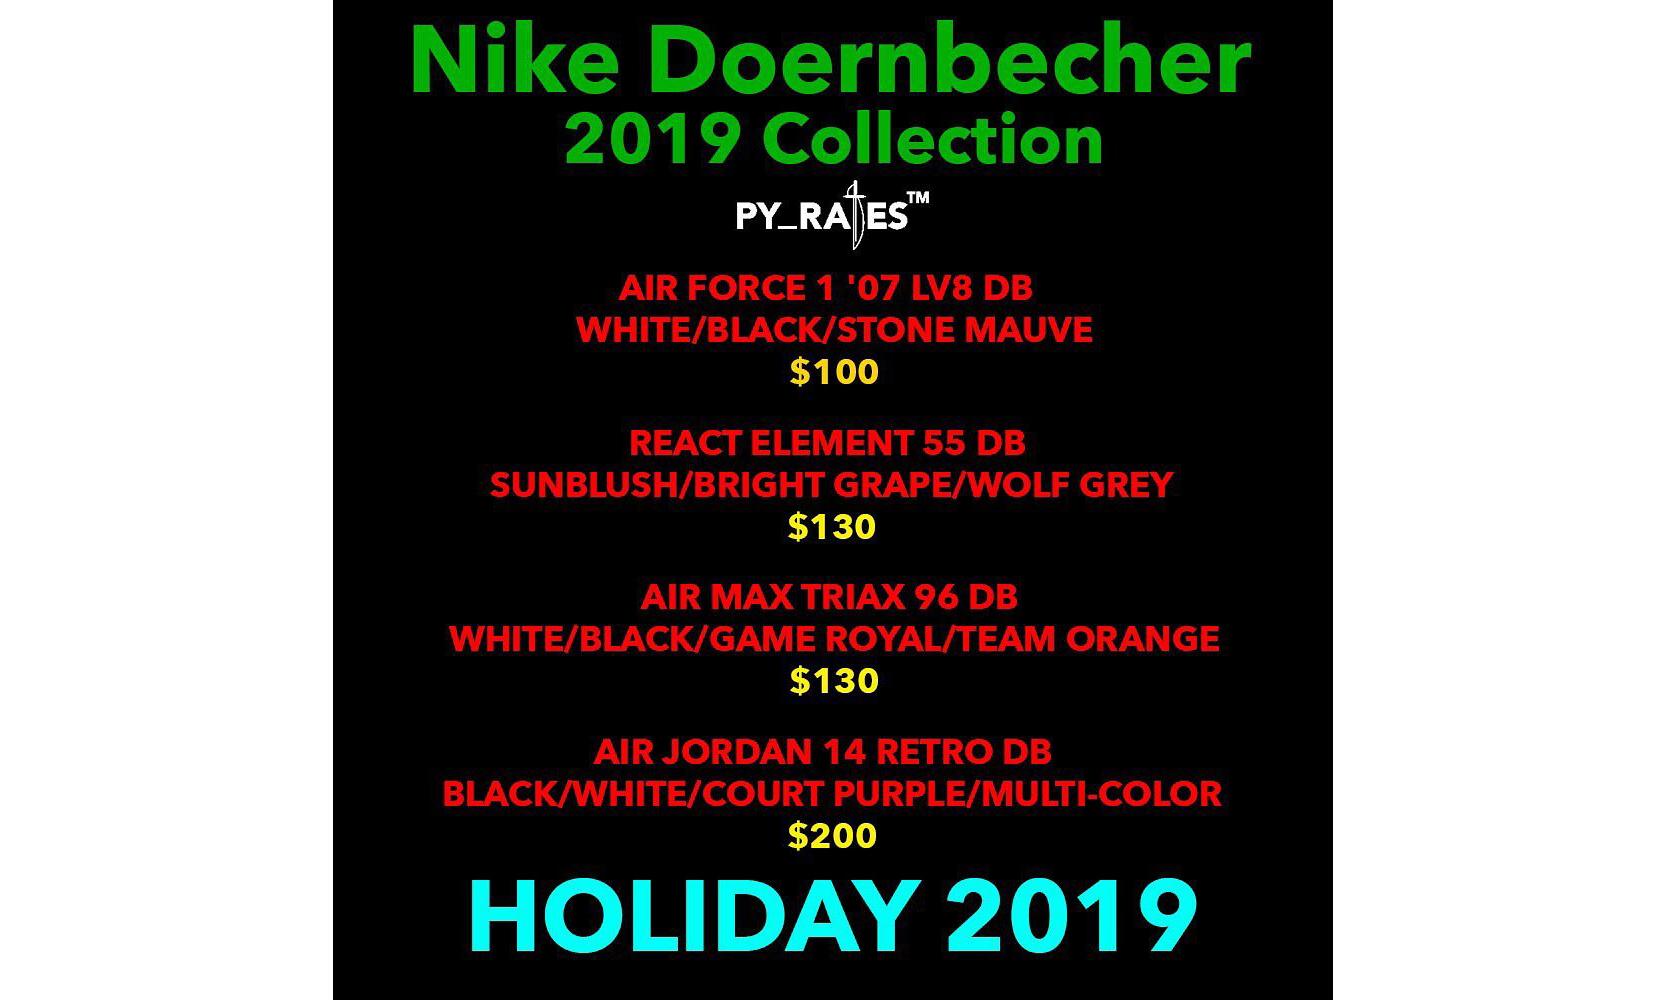 Nike Doernbecher Freestyle 2019 系列发售计划释出